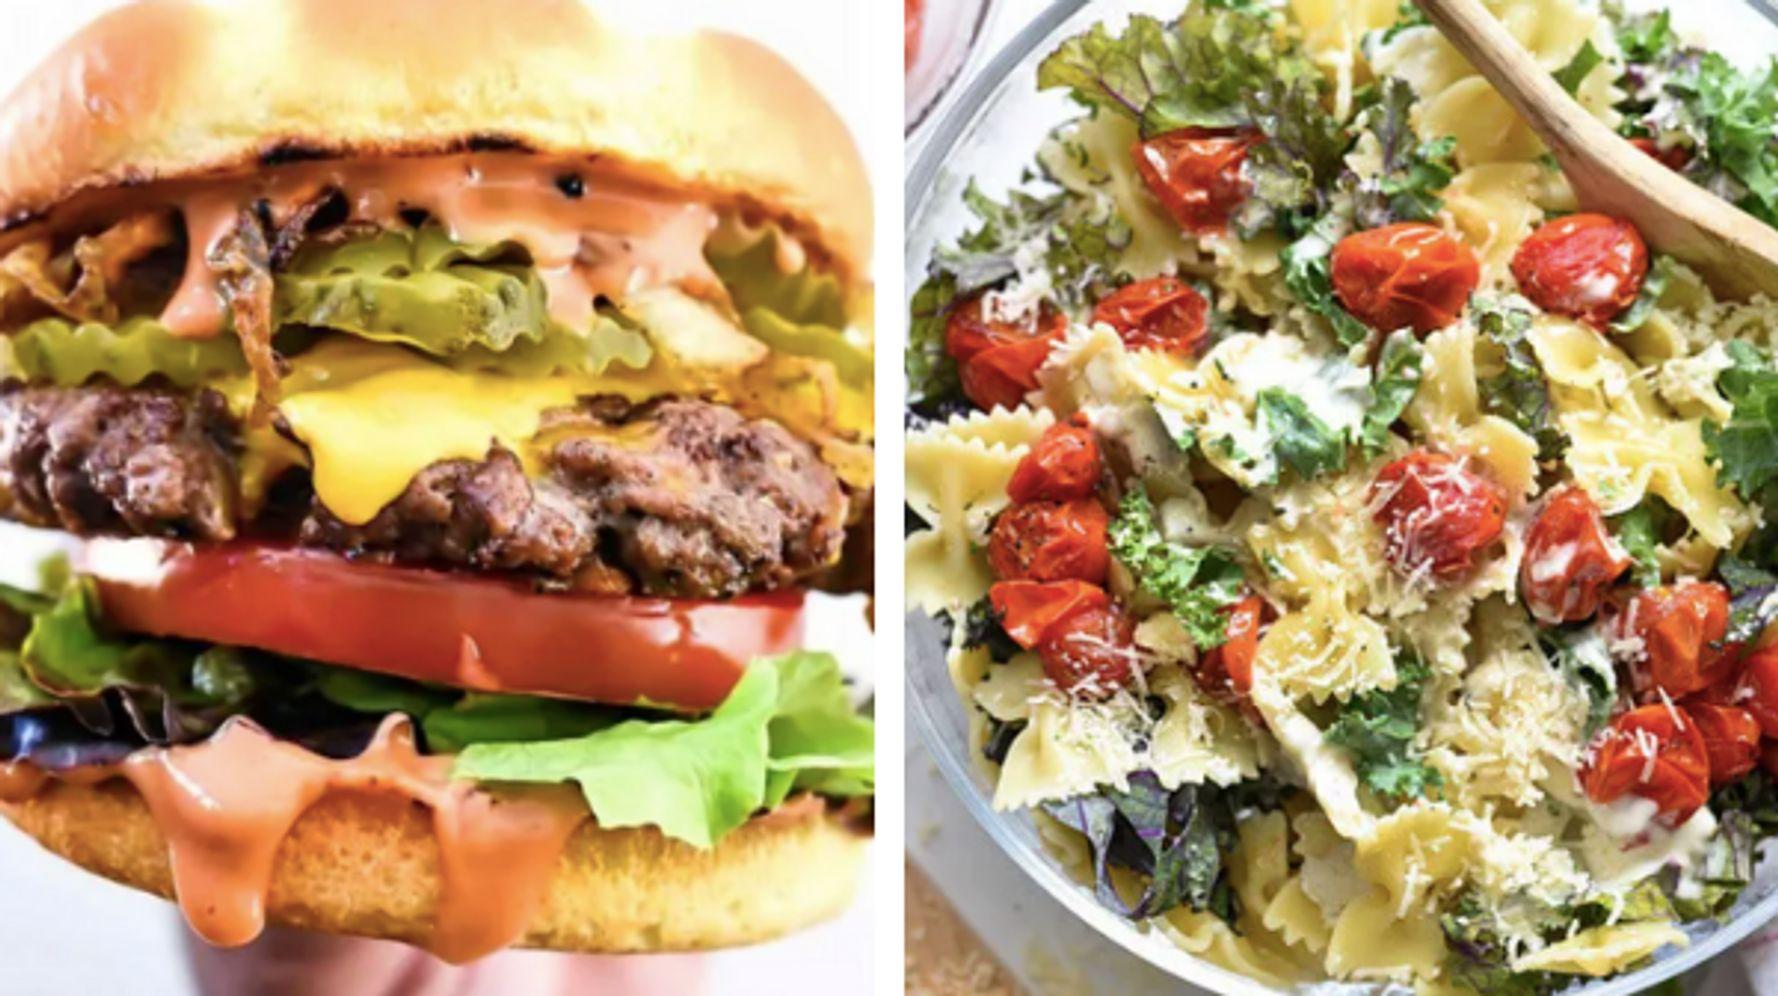 41 New Recipes To Inspire A Delicious 2020 Memorial Day Menu photo